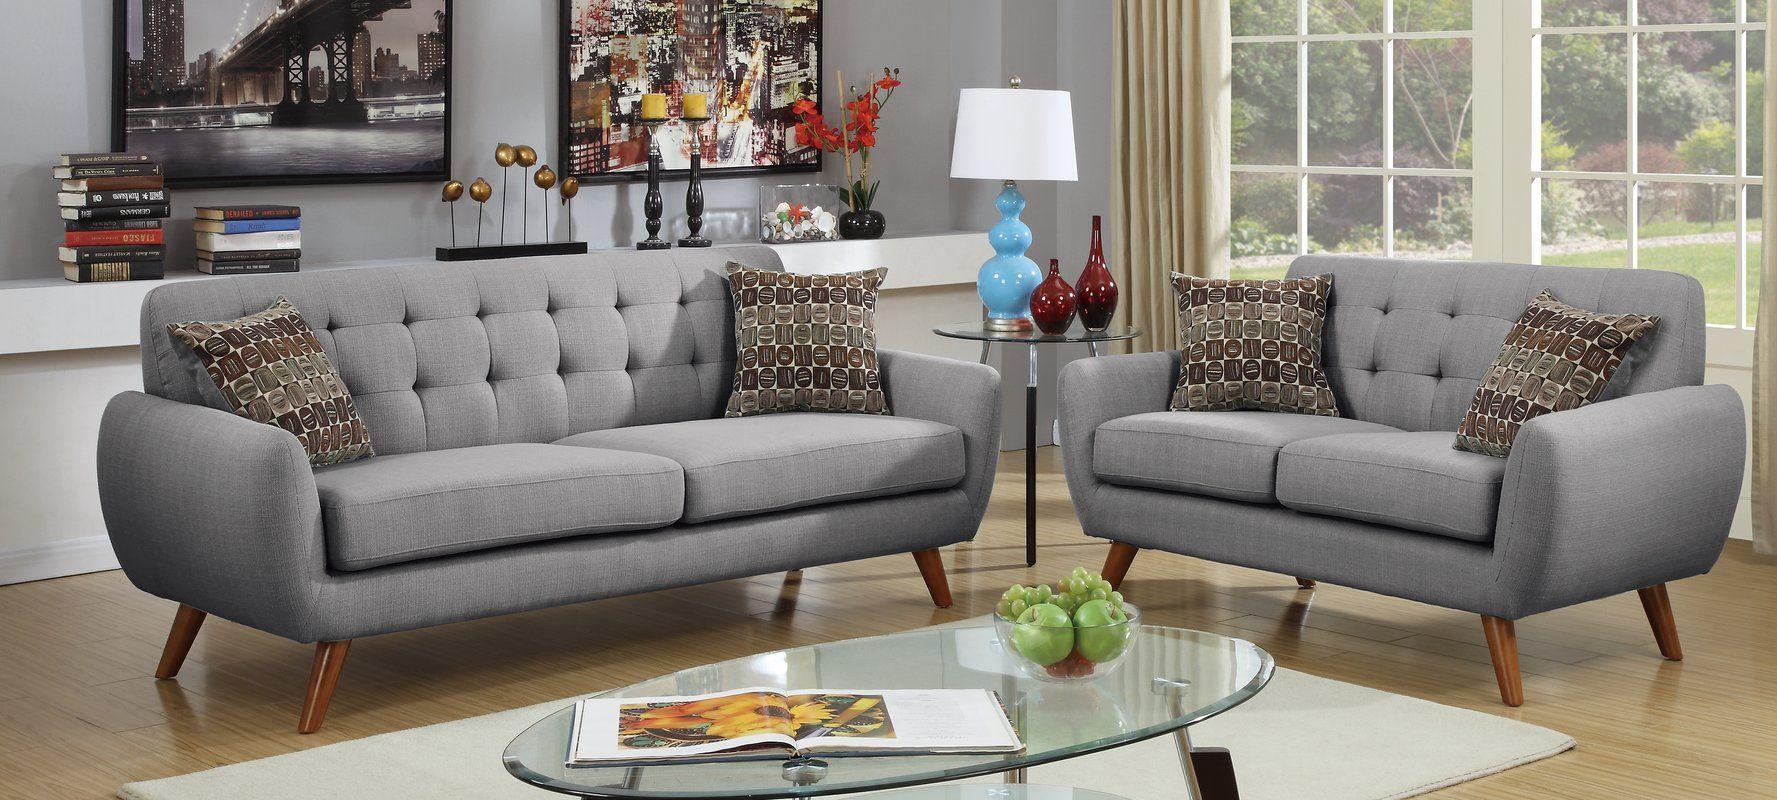 Takeo piece living room set livingroom remodel pinterest